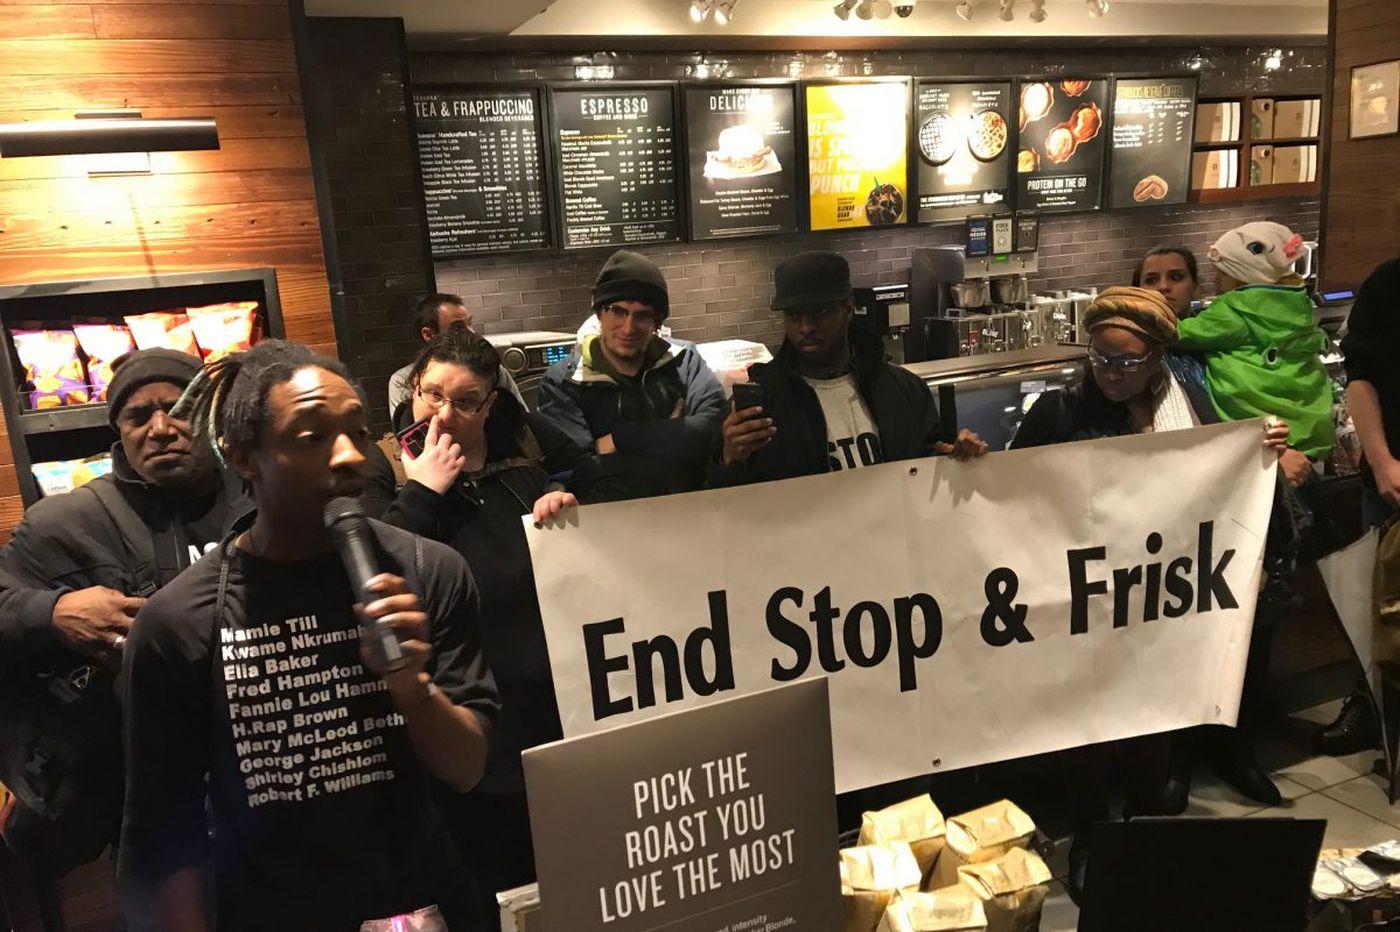 Protests mount, Starbucks CEO apologizes, for arrests of 2 black men at Philadelphia store